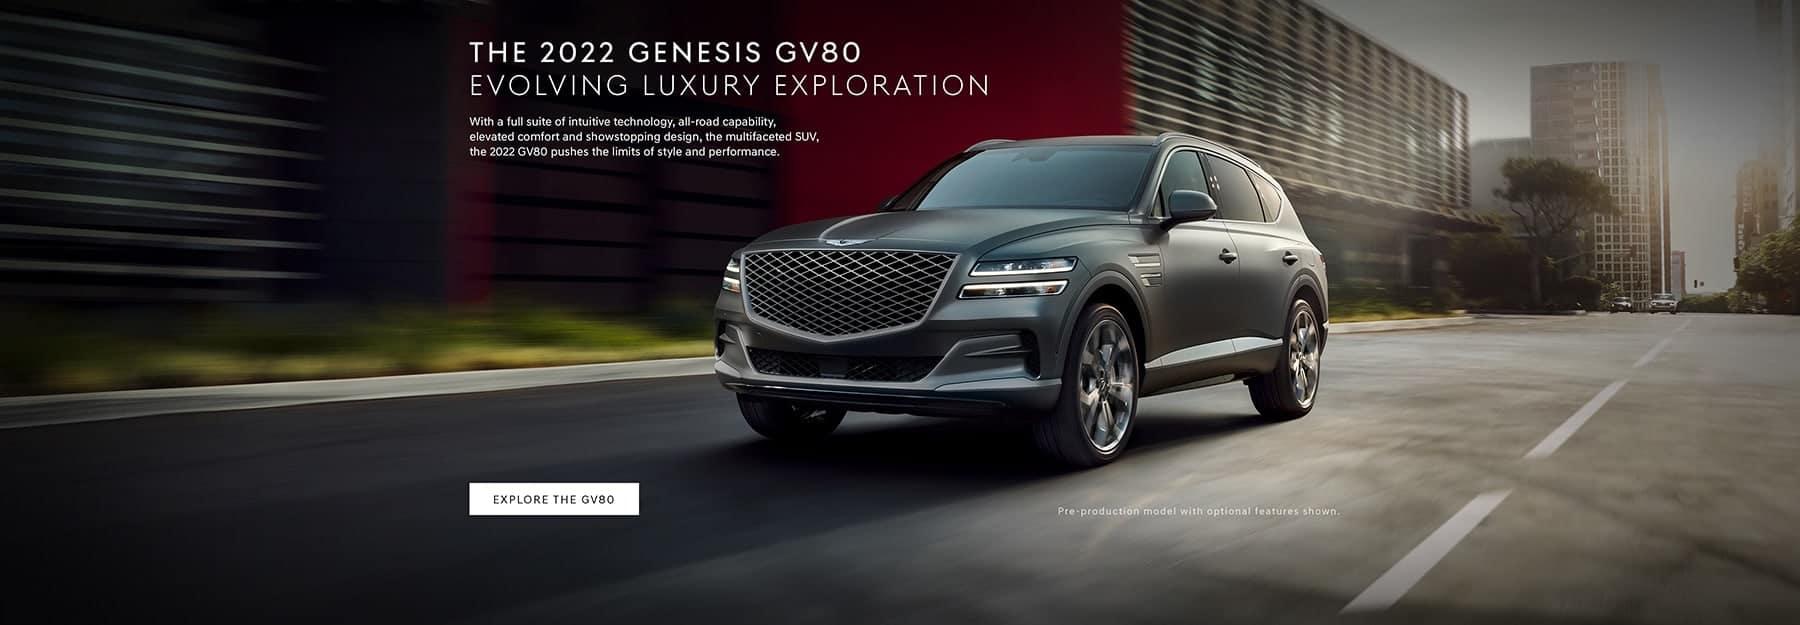 2022 Genesis GV80